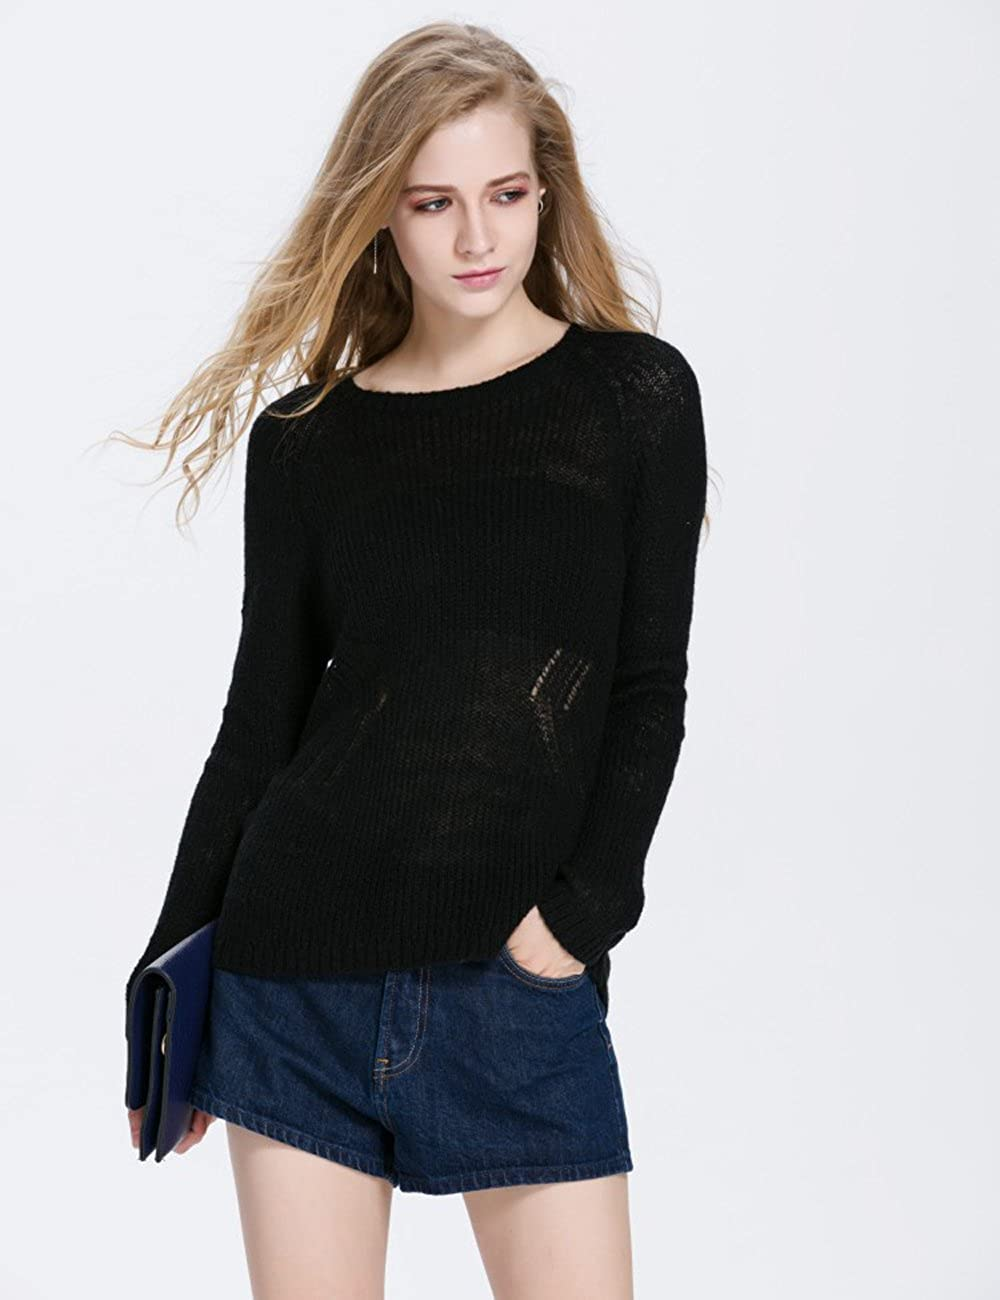 Syplnitu Womens Woolen Sweater Fashion Round Neck With Bowknots Design